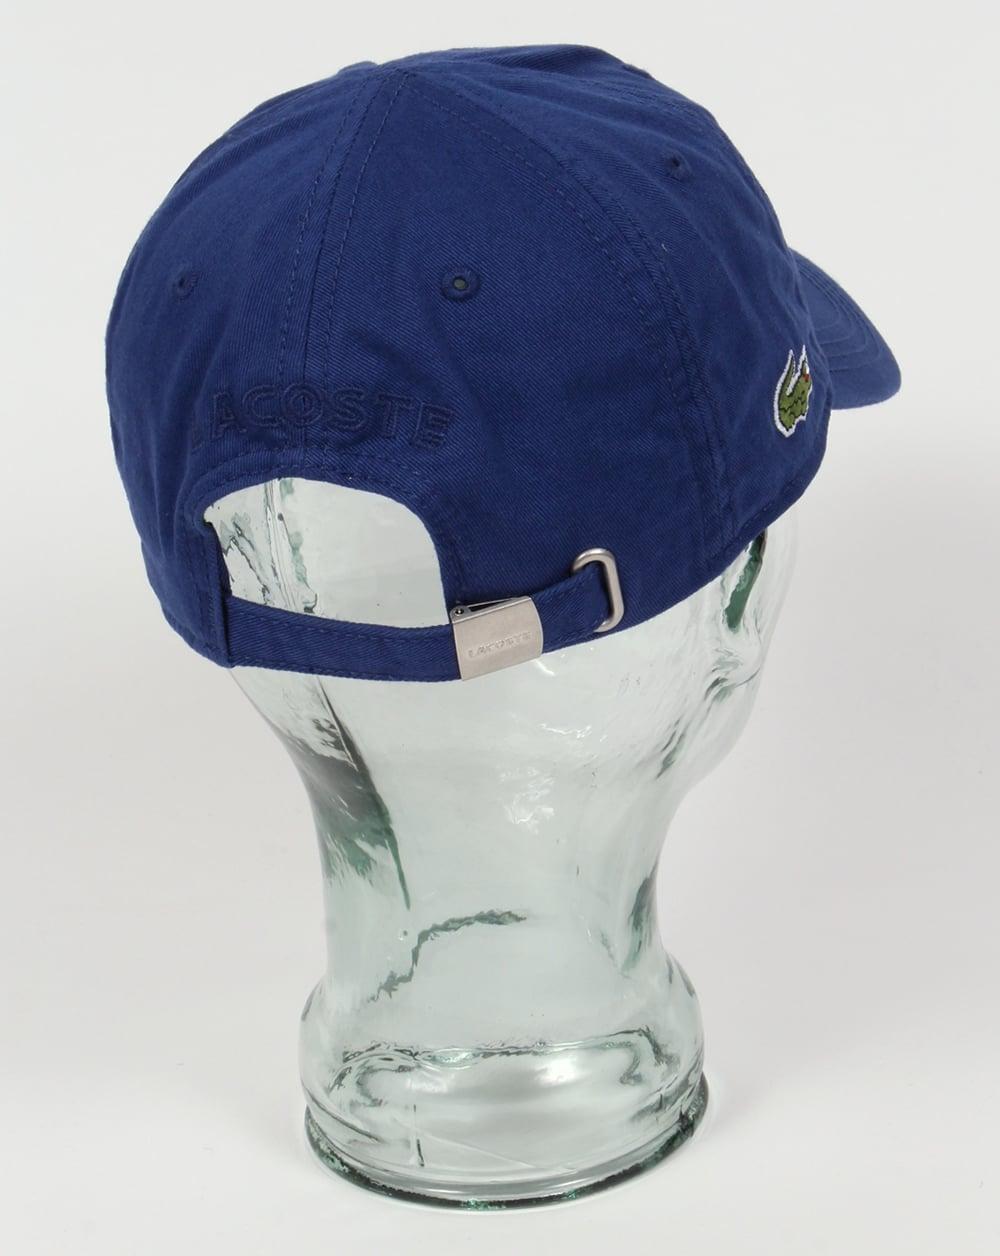 84a06828c451 Lacoste Gabardine Baseball Cap Royal Blue